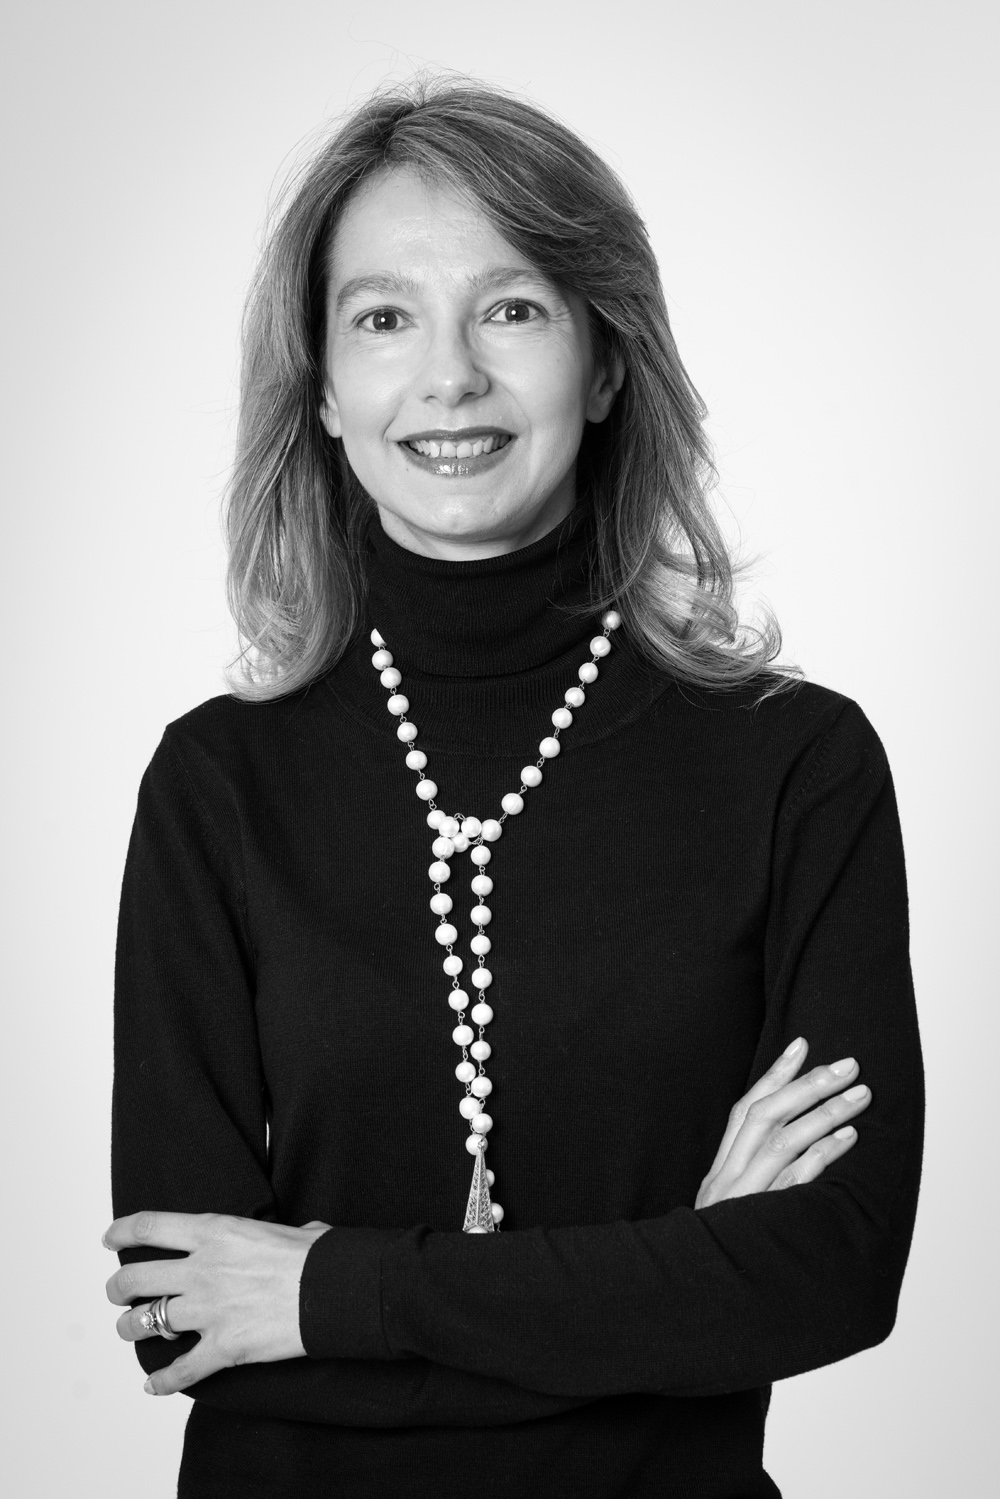 Teresa Silva Tavares